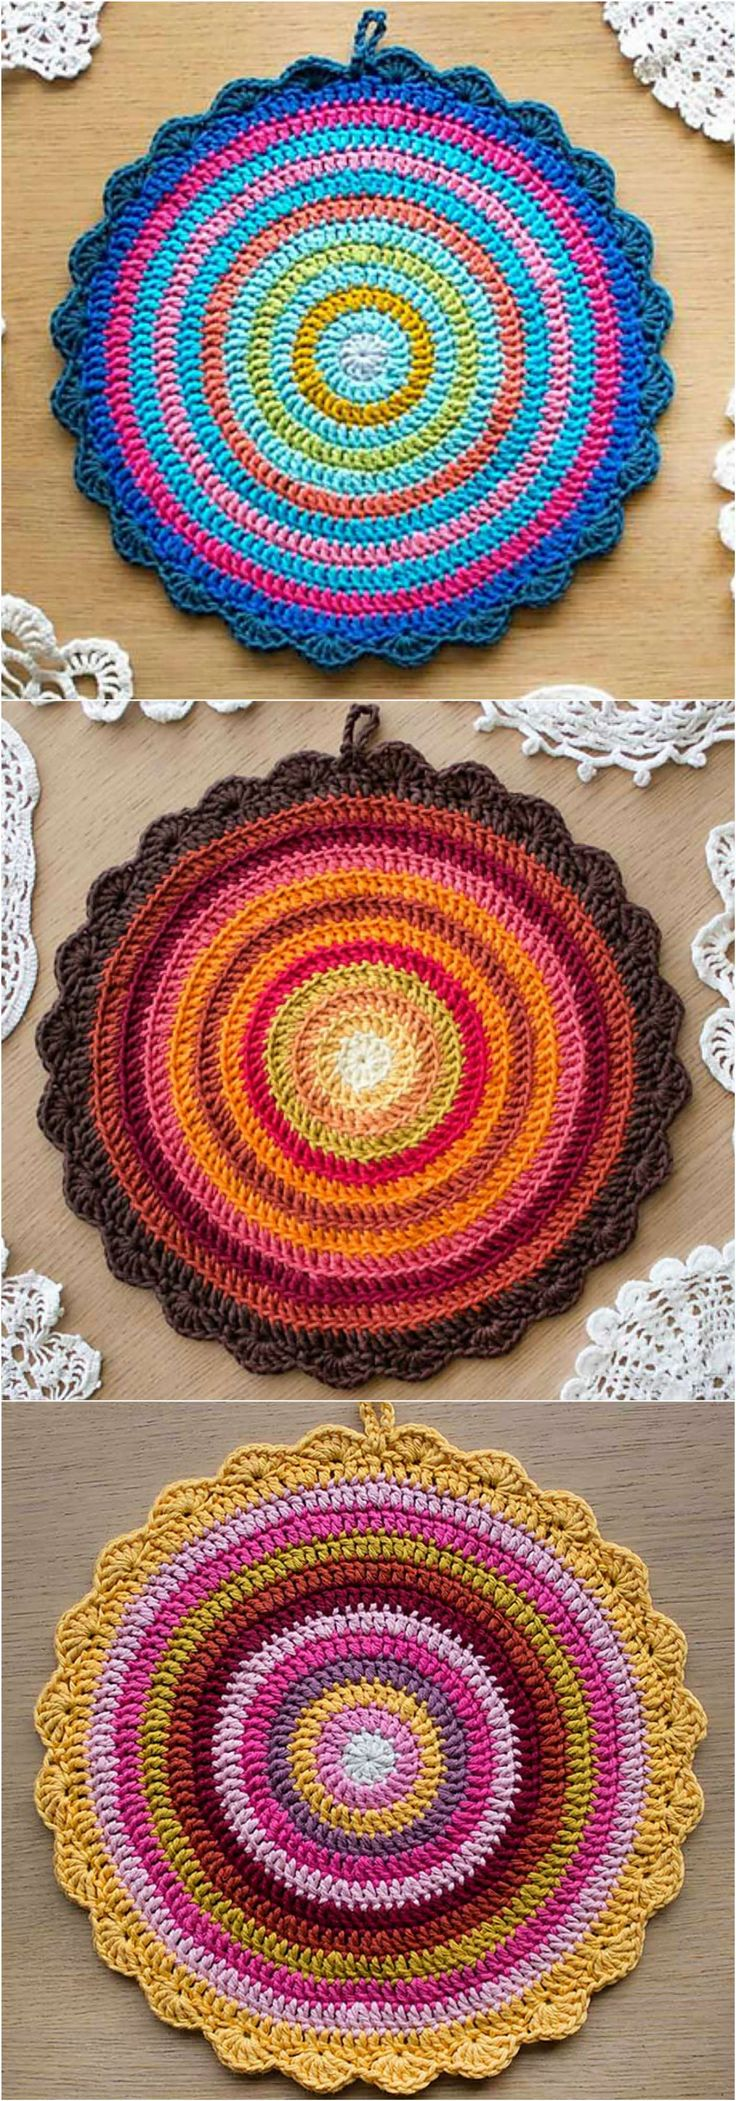 Crochet Standard 12 Round Mandala